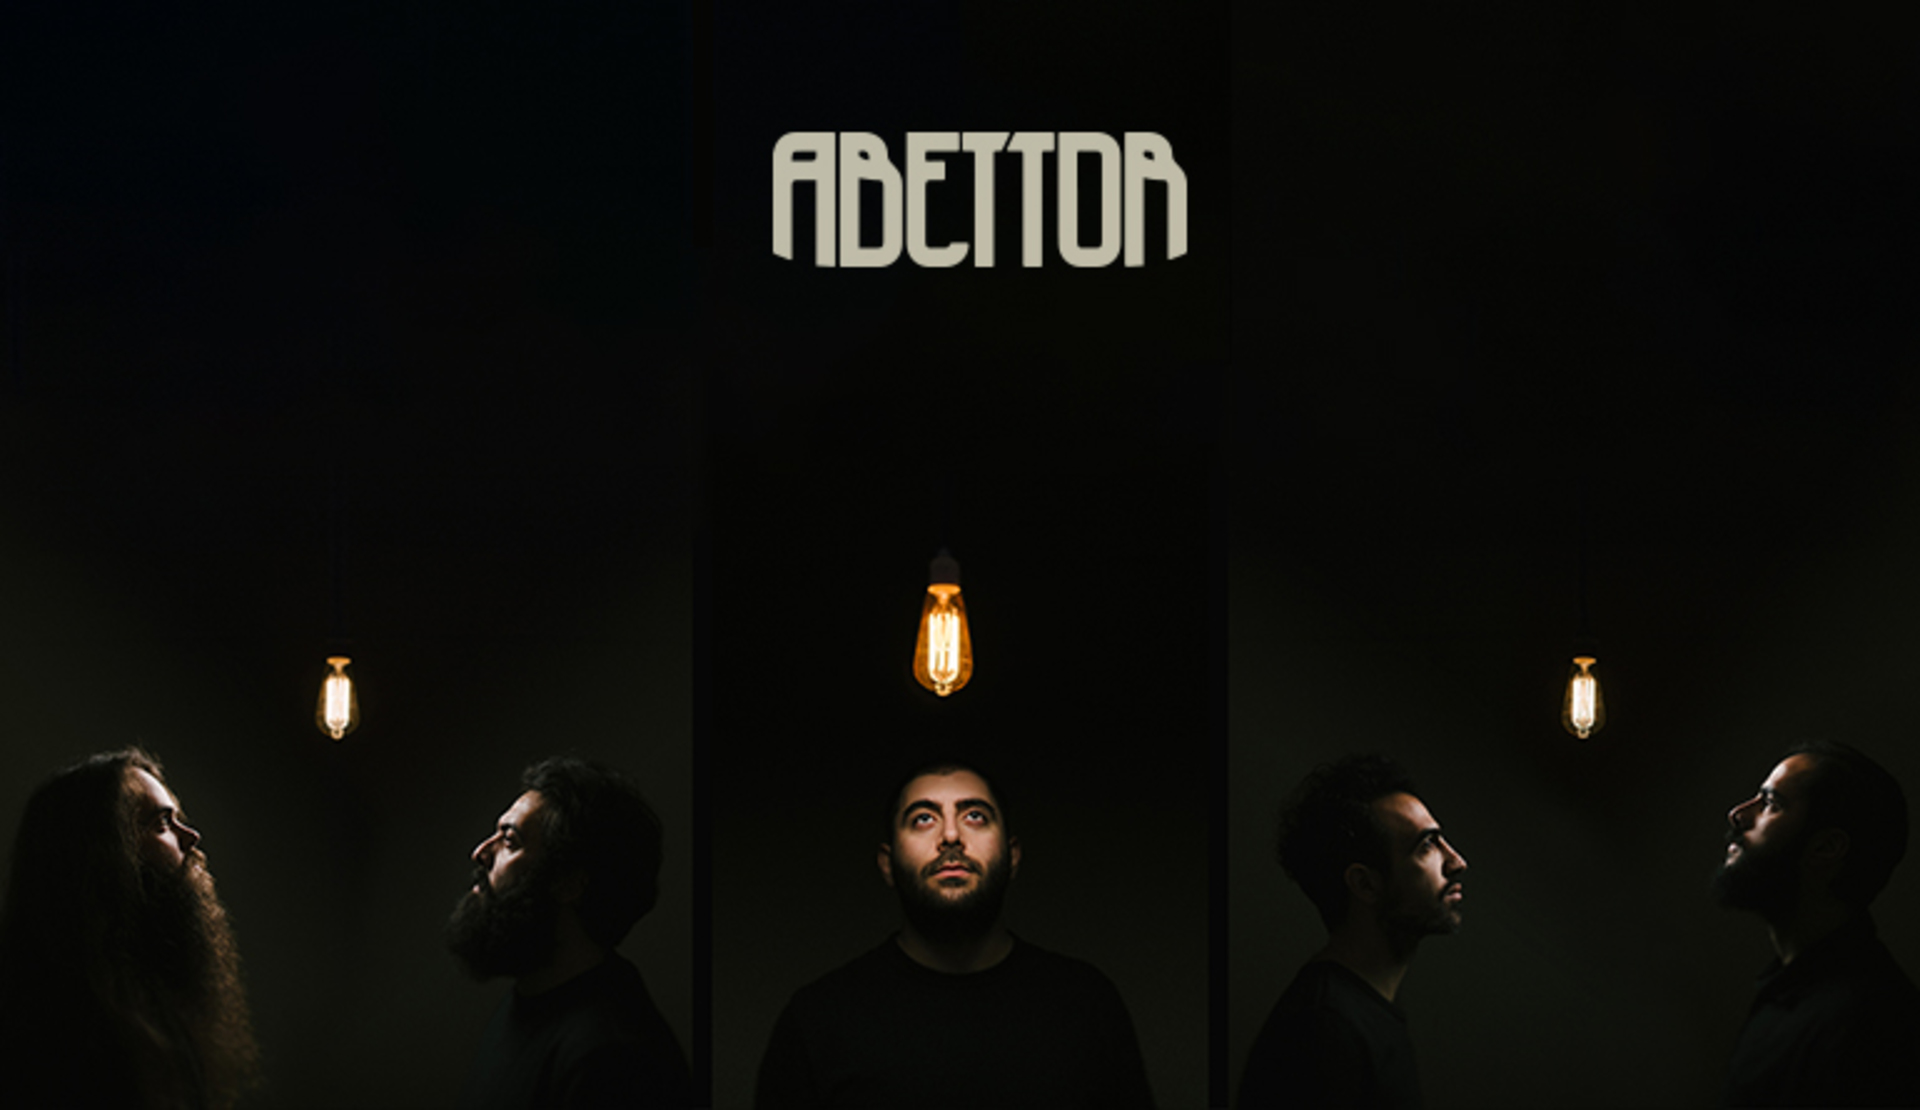 Abettor lamp collage